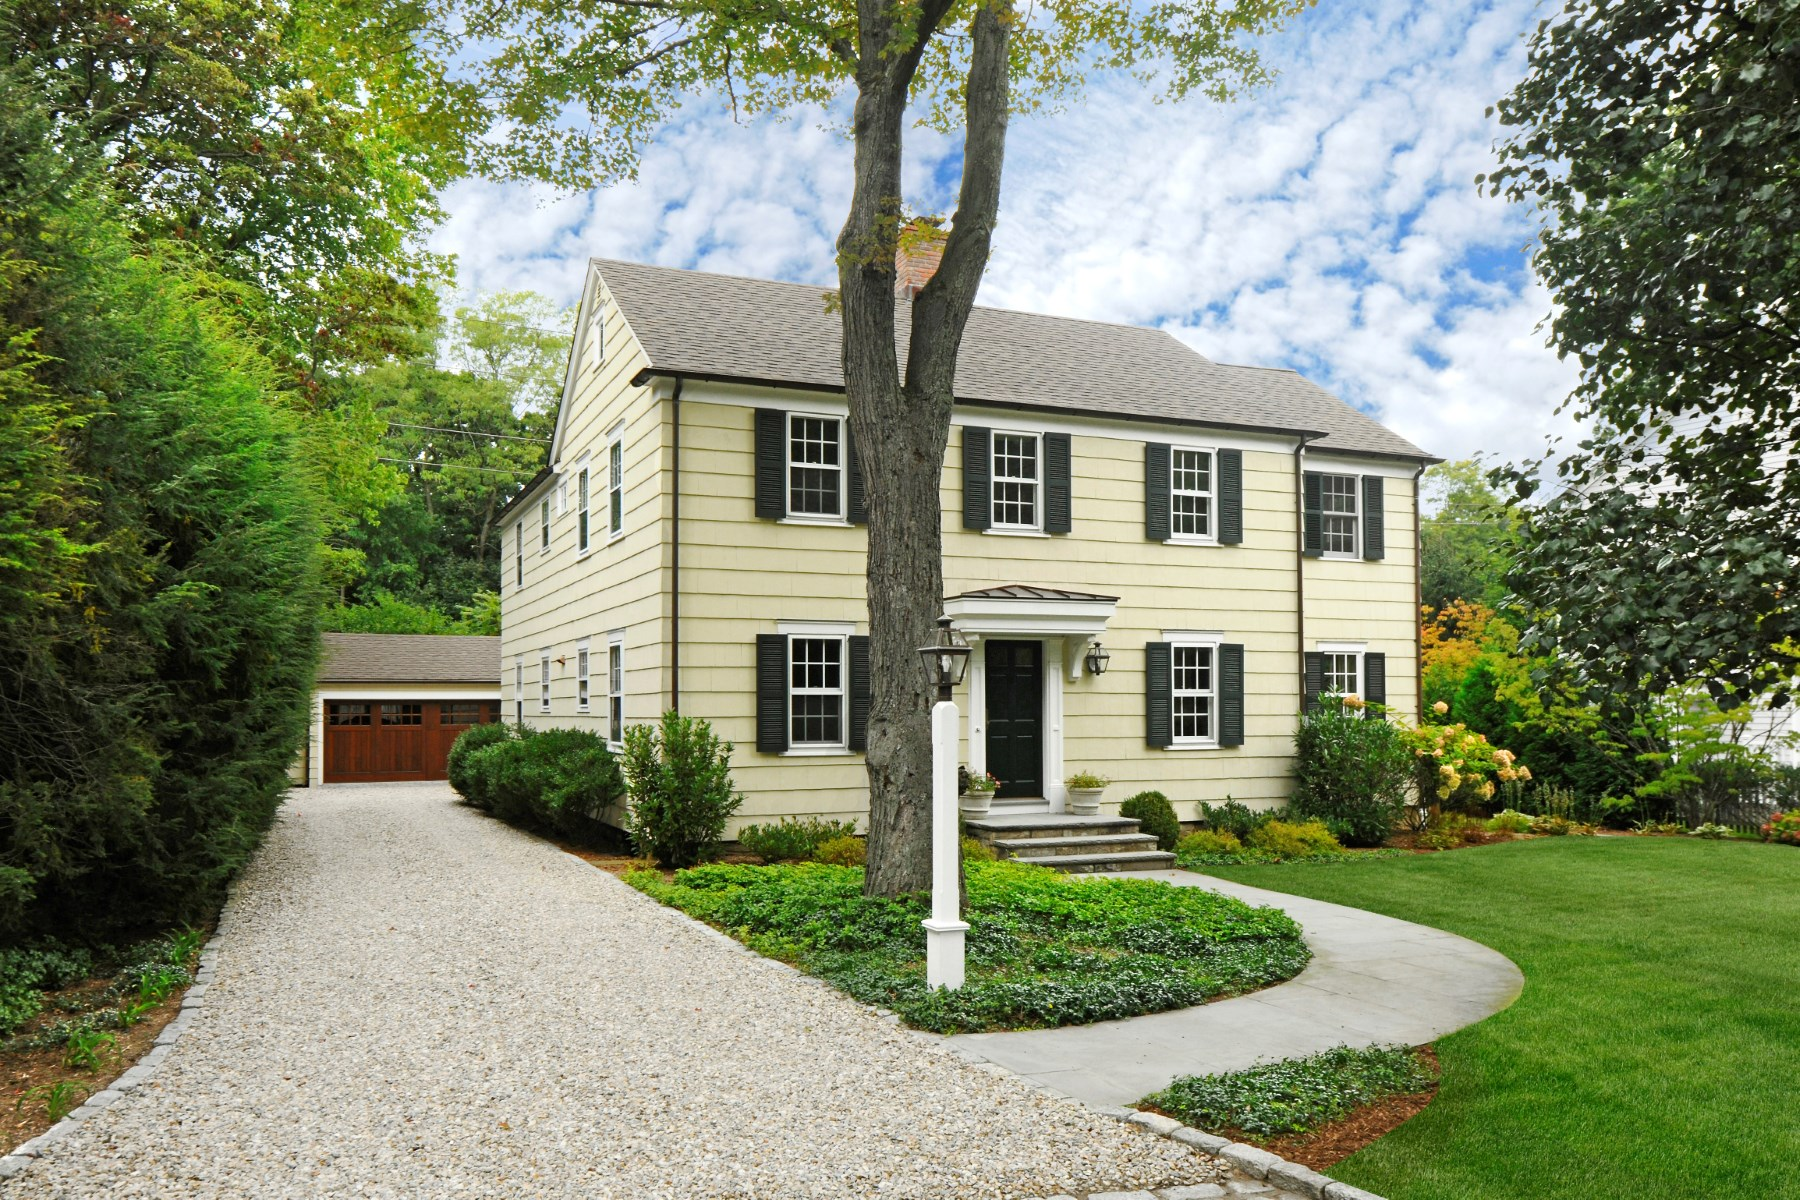 Casa para uma família para Venda às Lovely Renovated Classic in Riverside 93 Summit Road Riverside, Connecticut 06878 Estados Unidos